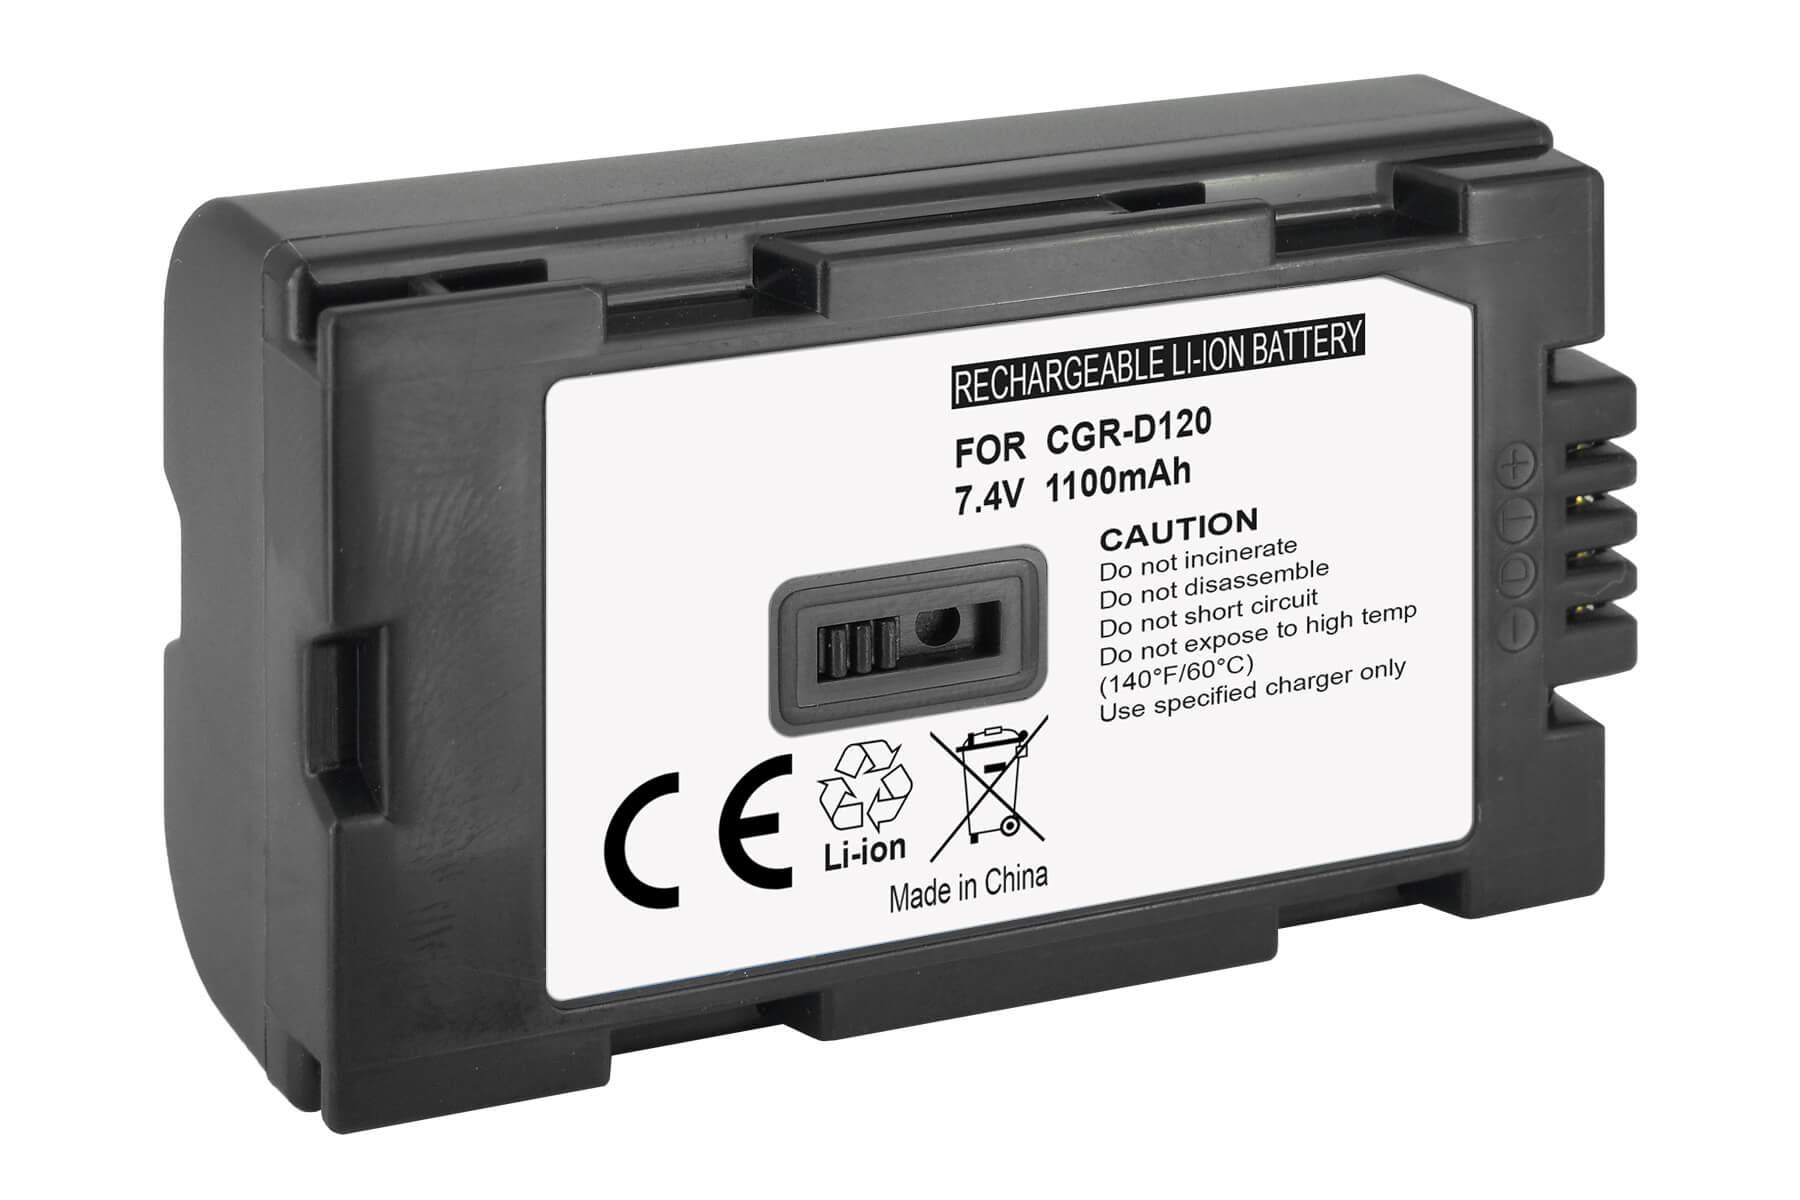 2in1 DUAL CARICABATTERIA VHBW DISPLAY CGR-D16 per Panasonic CGR-D14